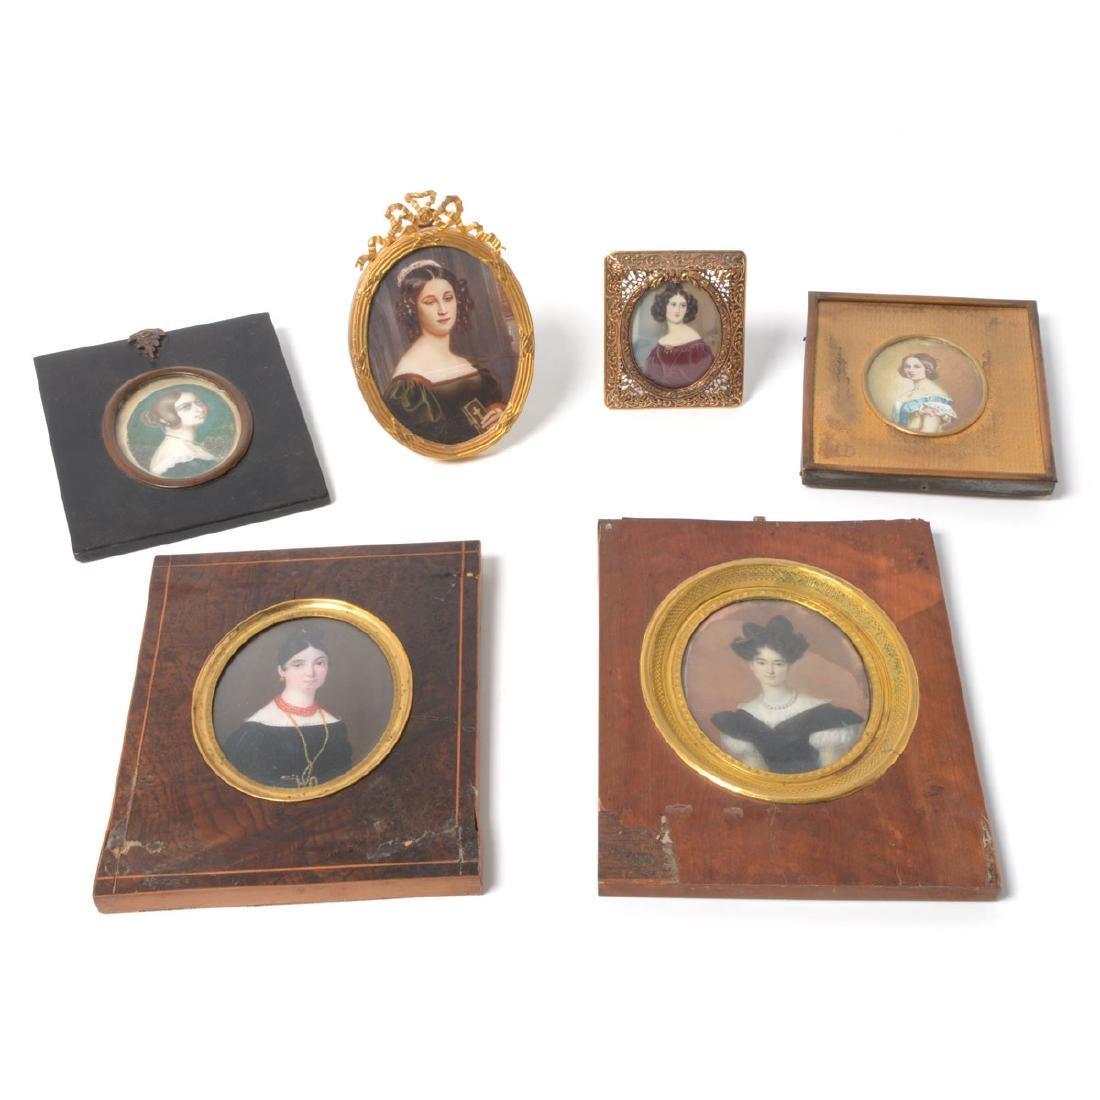 Six Miniature Portraits of Pre-Civil War Era Women